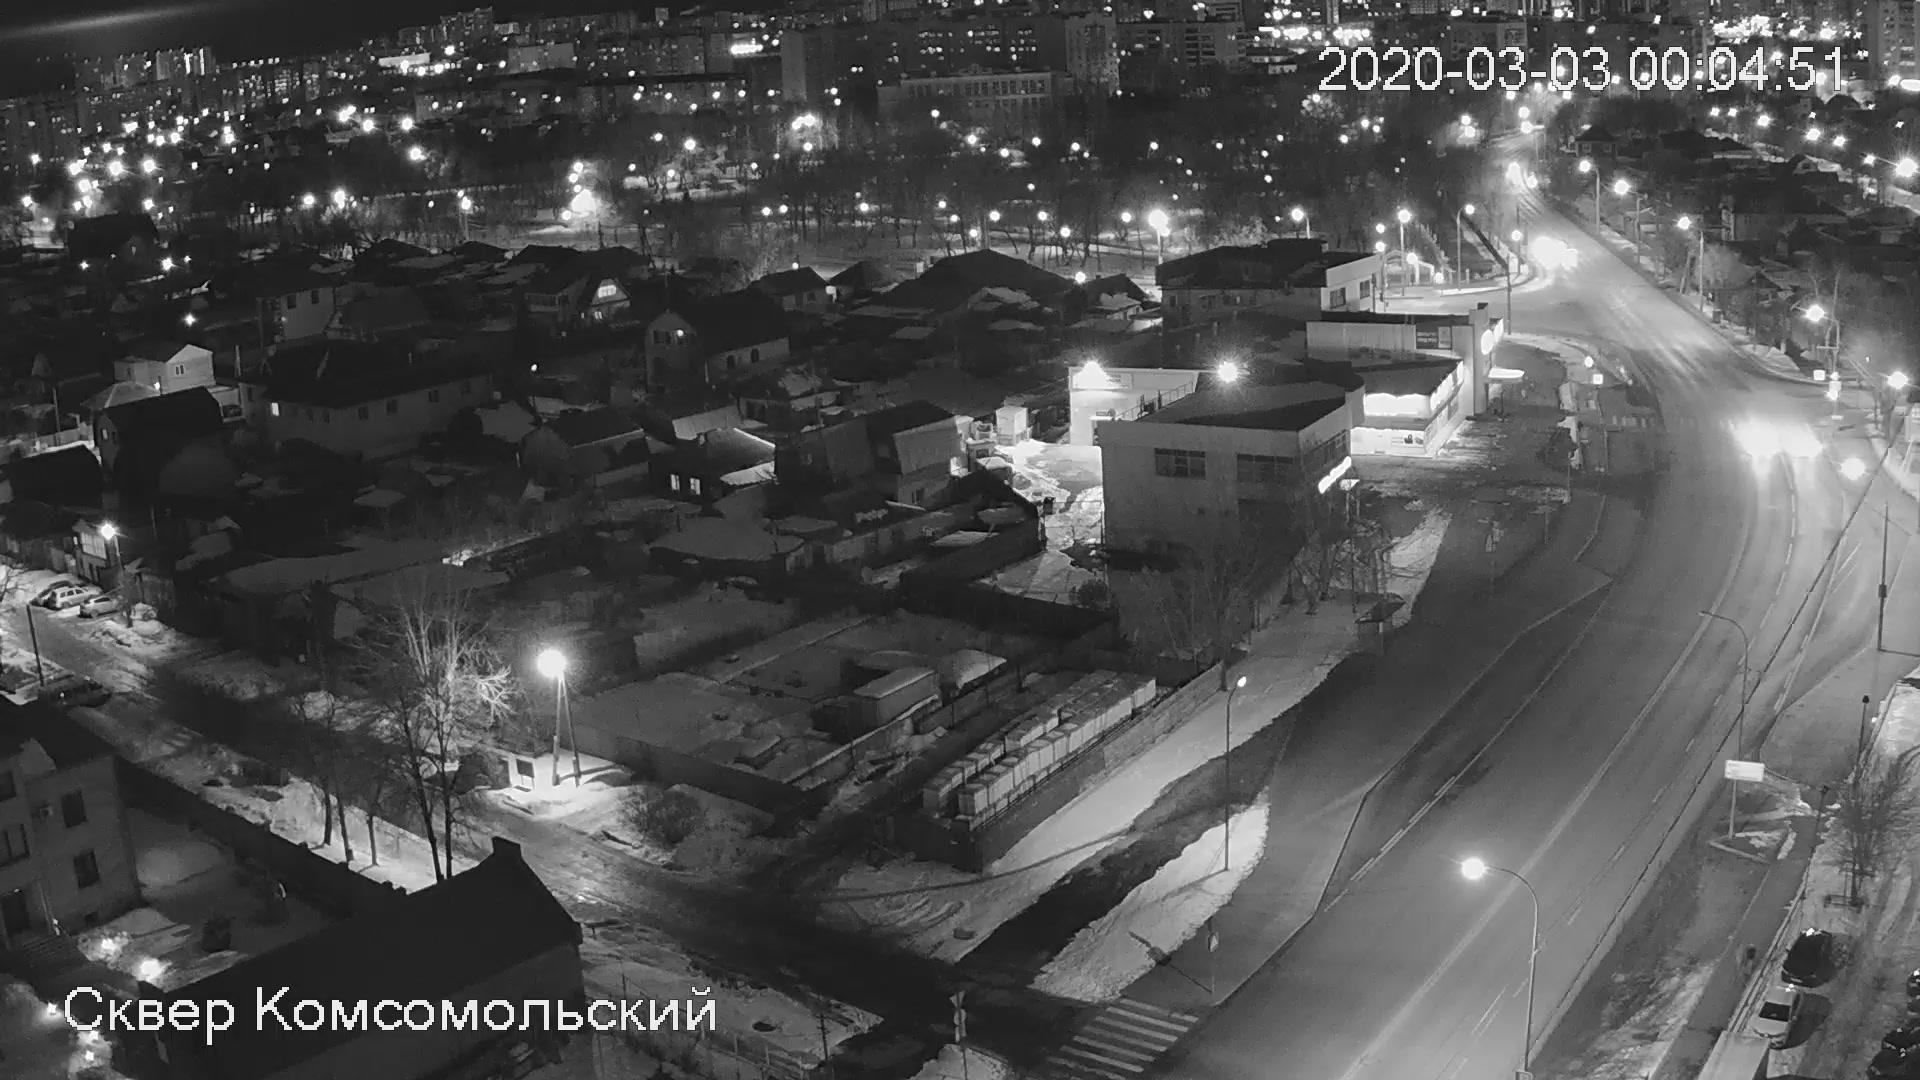 Webkamera Tyumen: Сквер Комсомольский